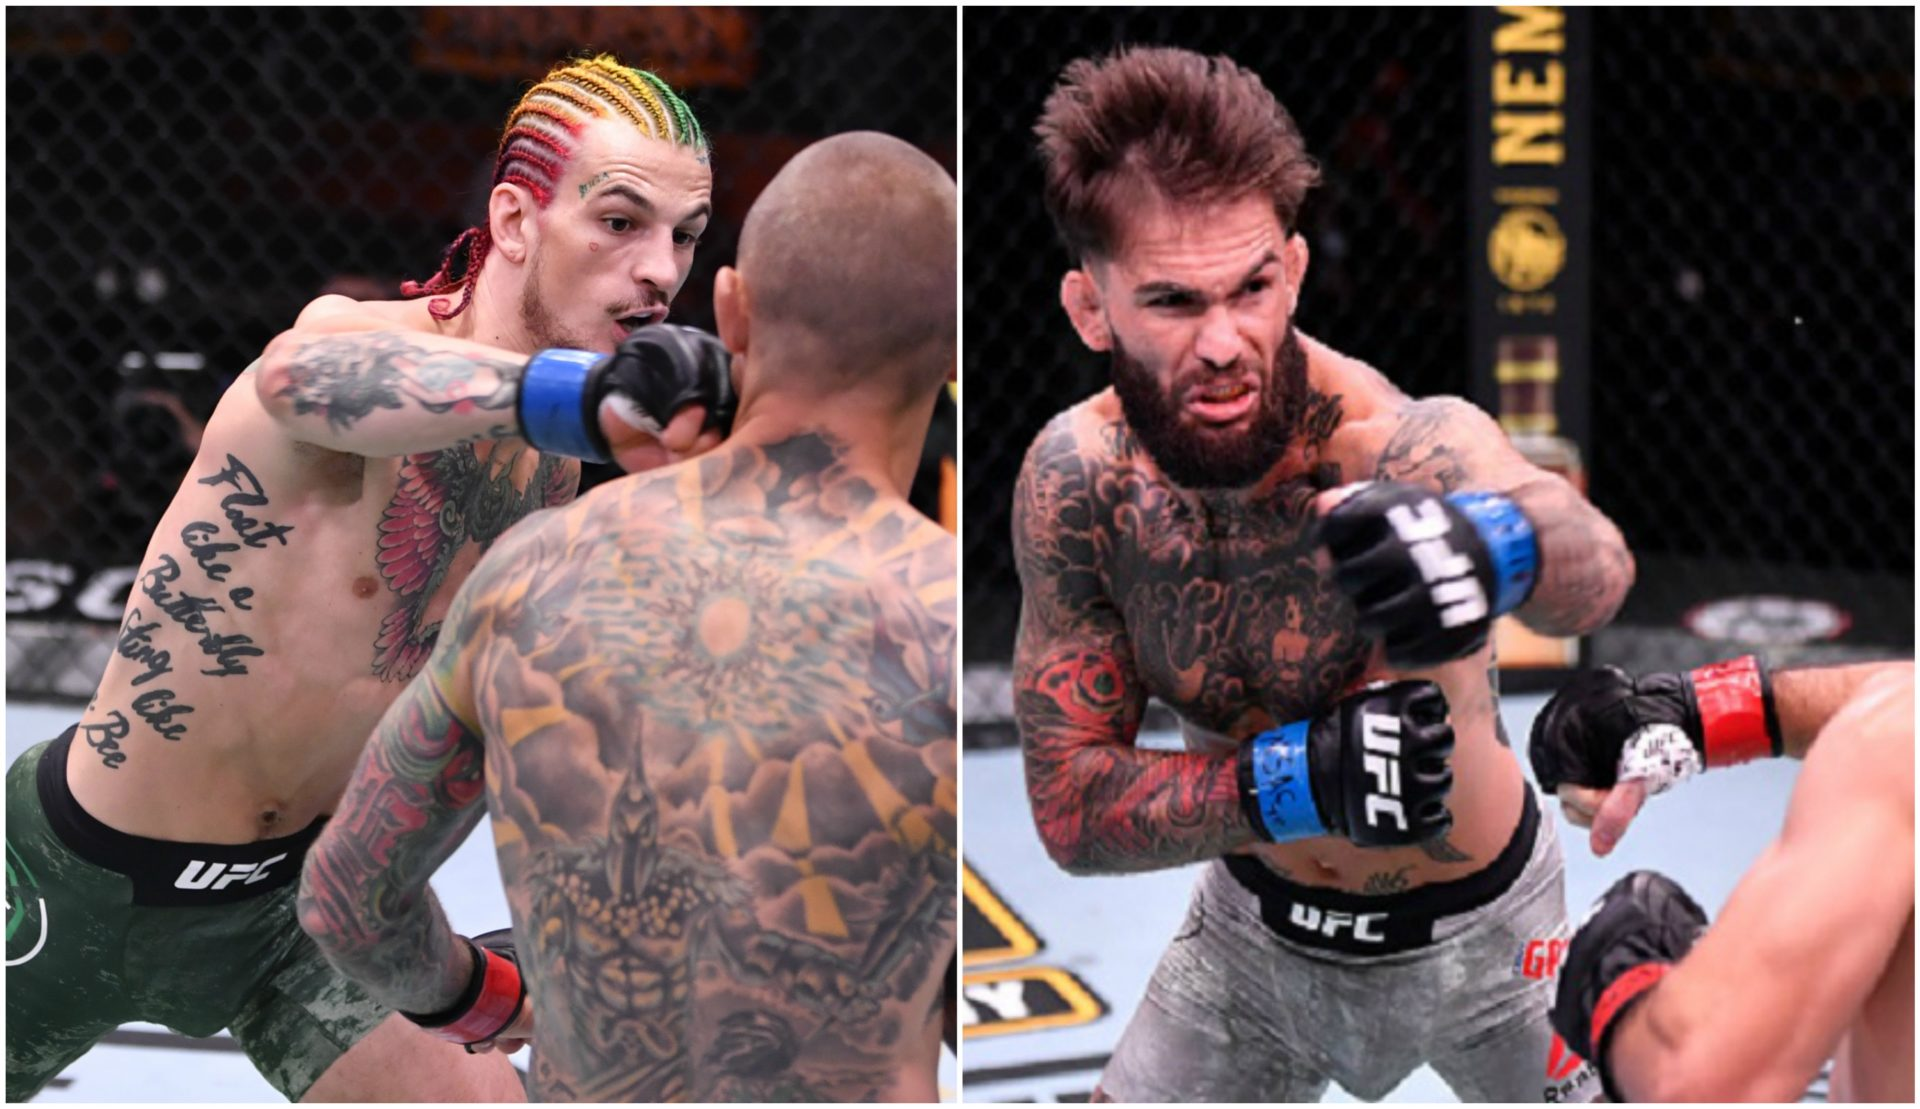 Sean O'Malley trolls Cody Garbrandt's 'barfight' KO at UFC 250 - Cody Garbrandt